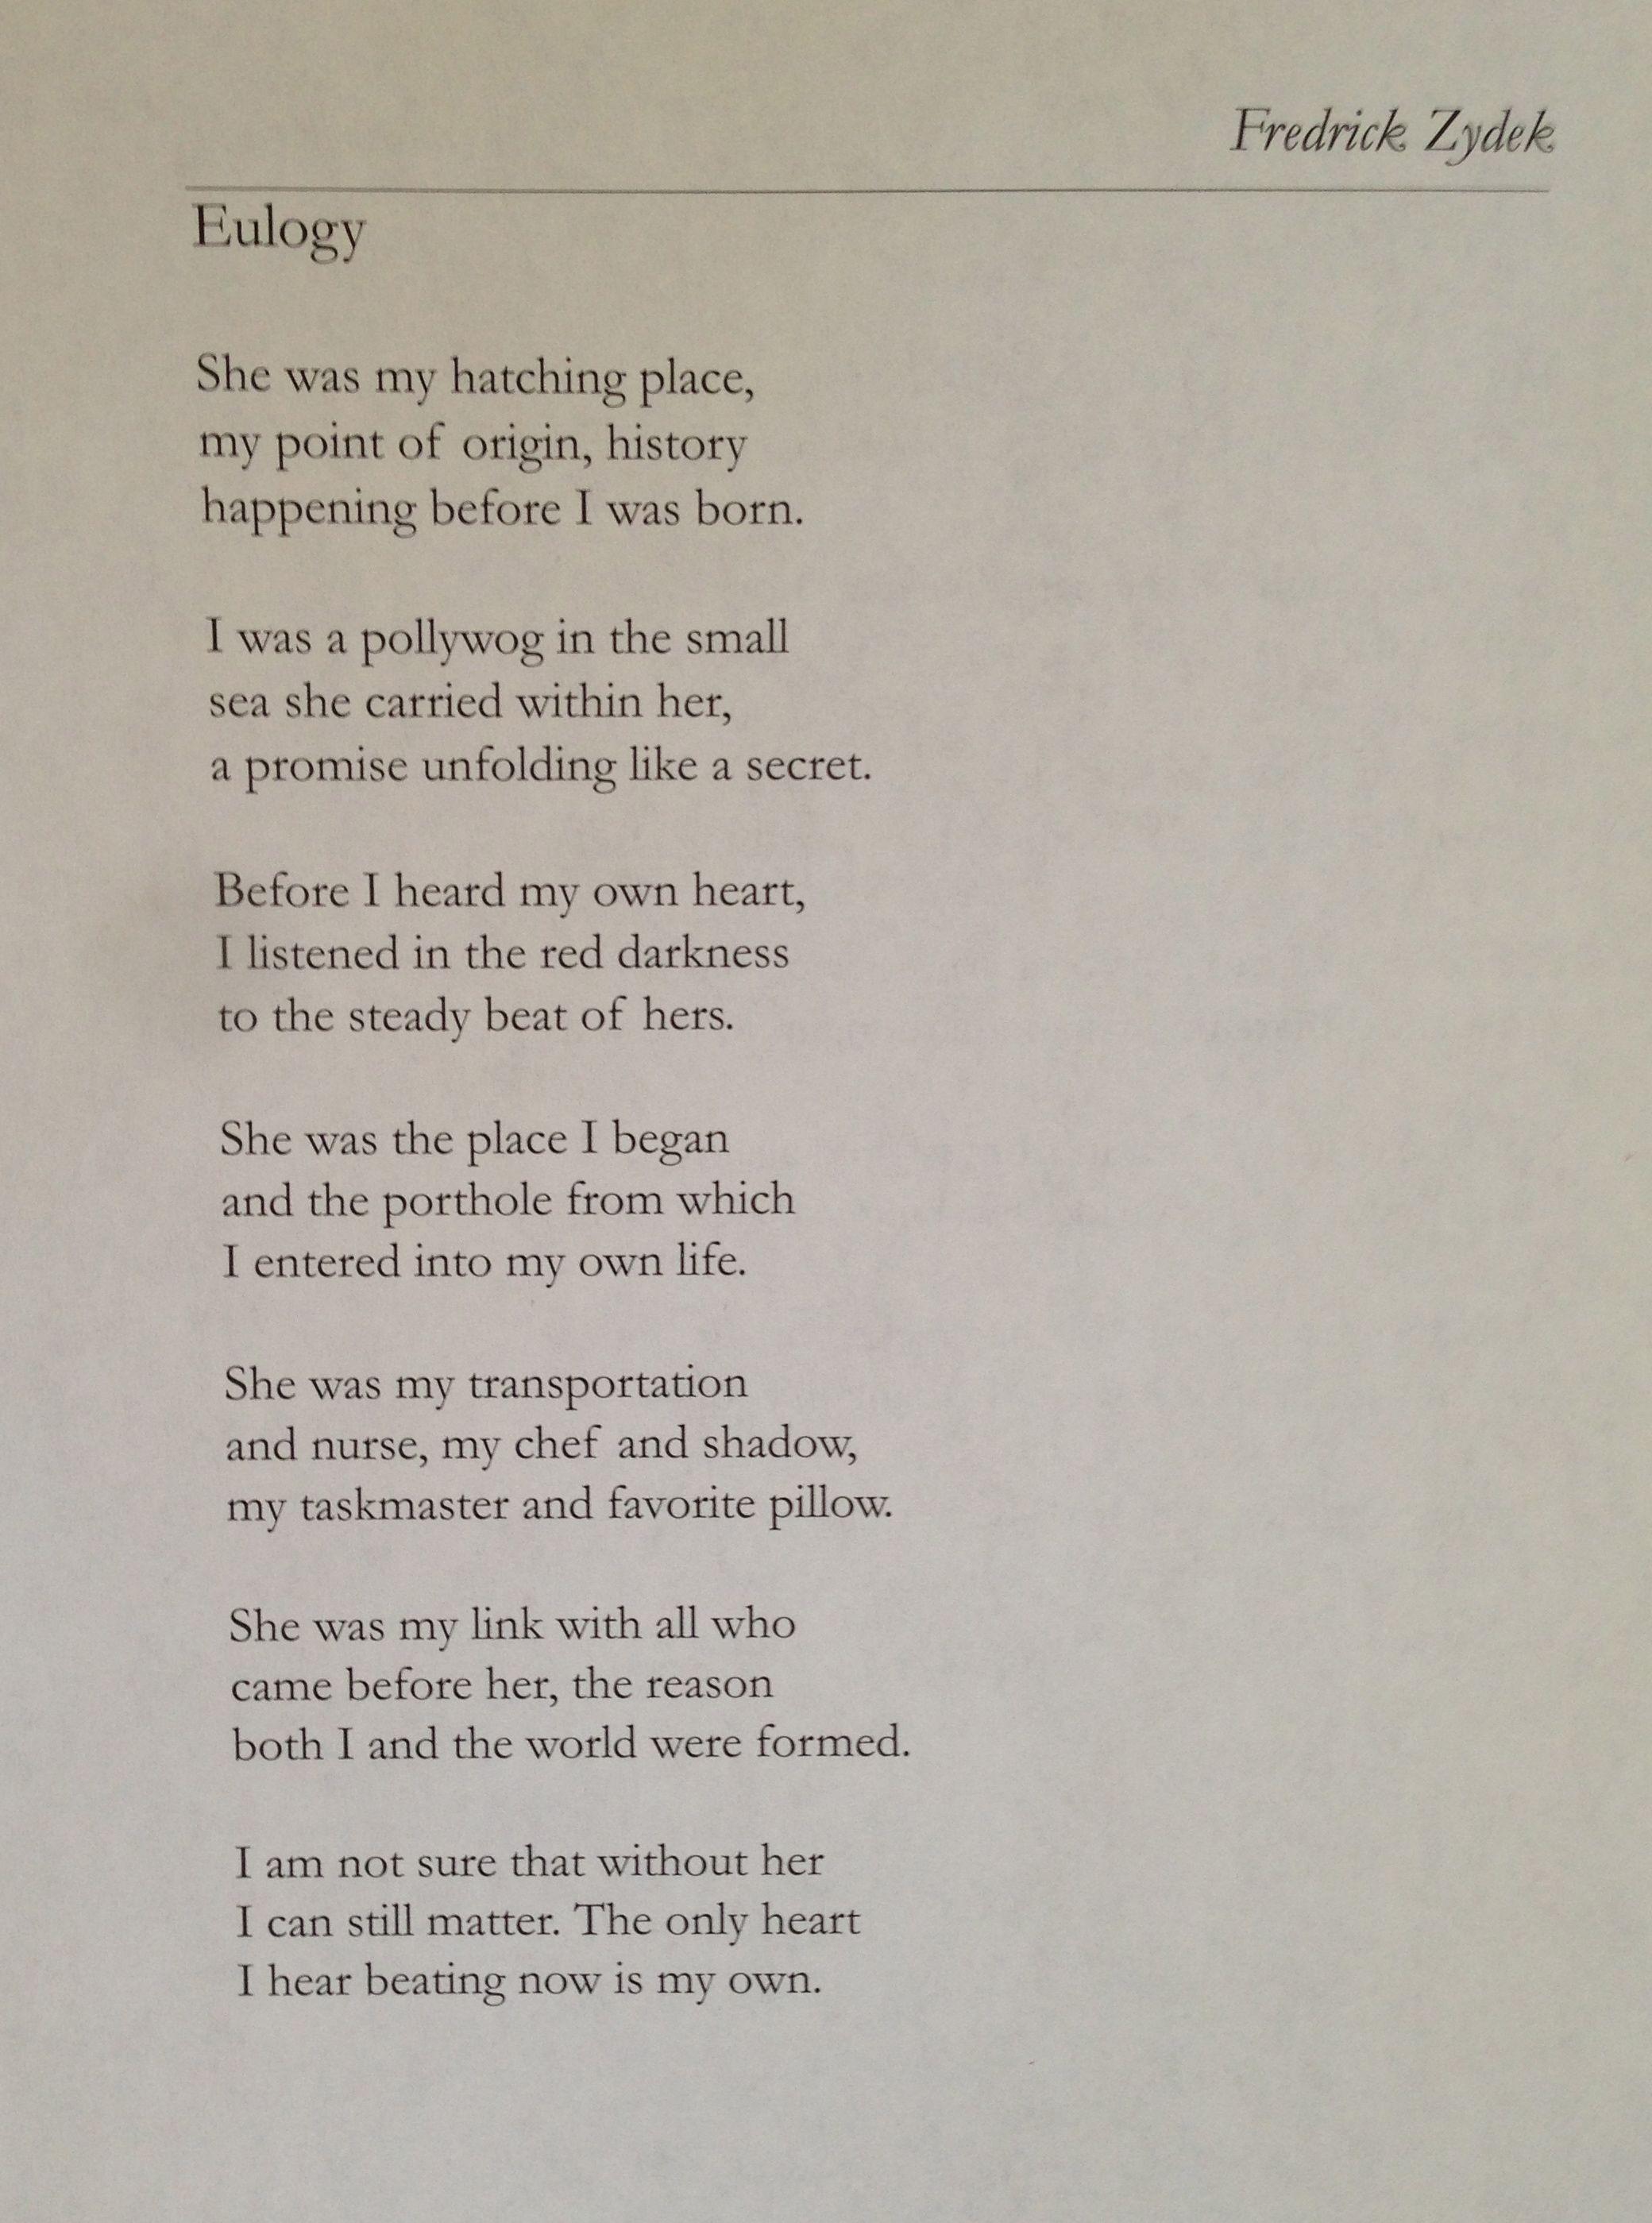 Eulogy by Fredrick Zydek Writings Pinterest